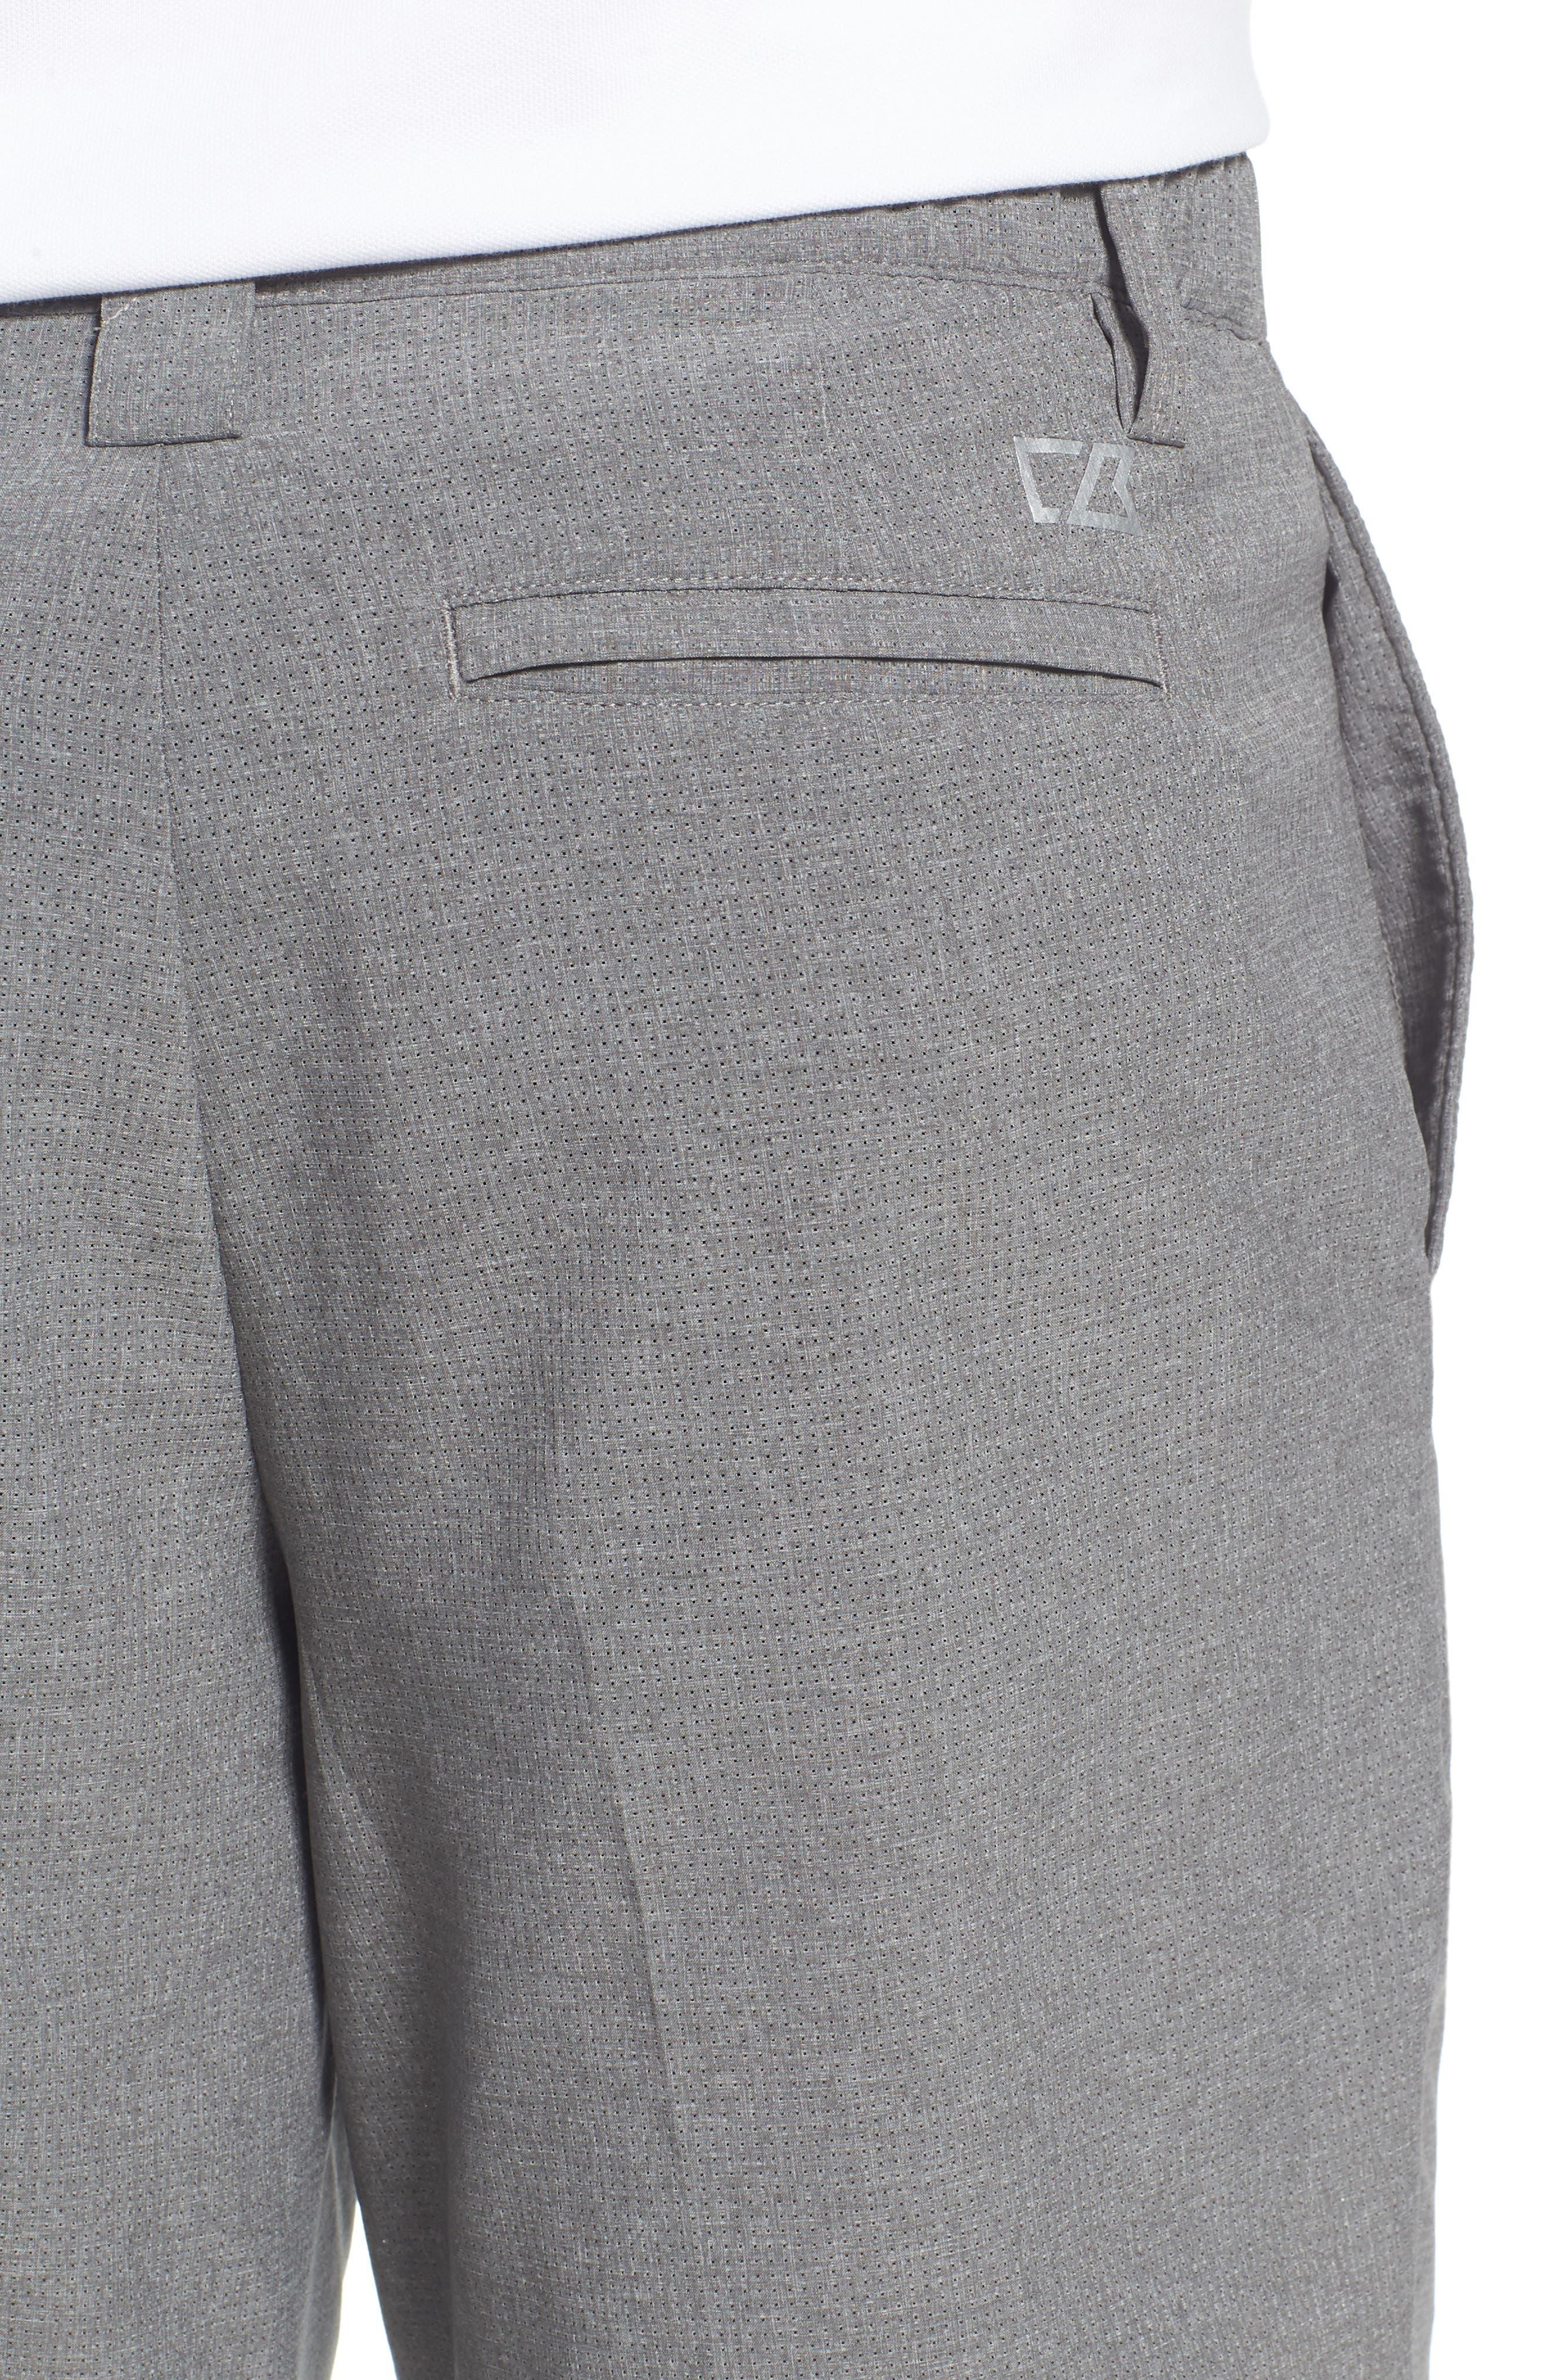 Windsor Active Classic Fit Shorts,                             Alternate thumbnail 4, color,                             GRAVEL